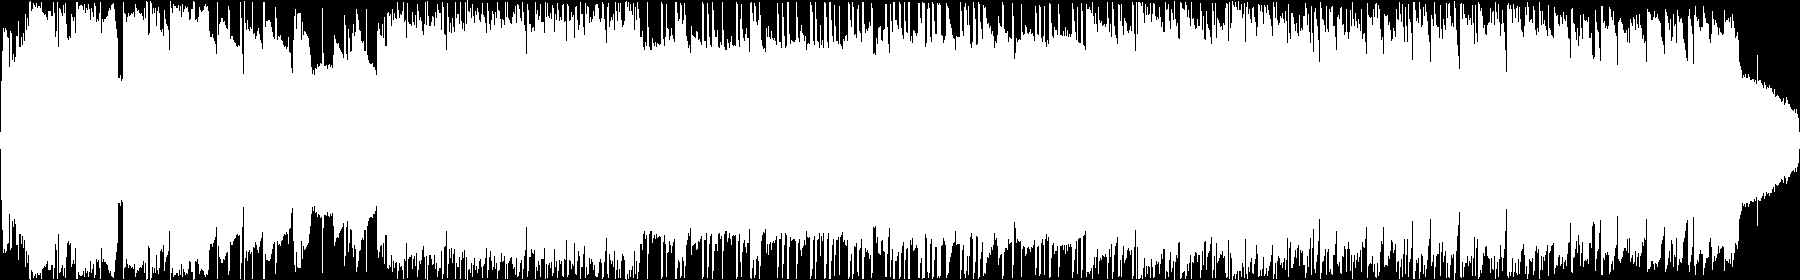 Xperimental Lo-Fi audio waveform